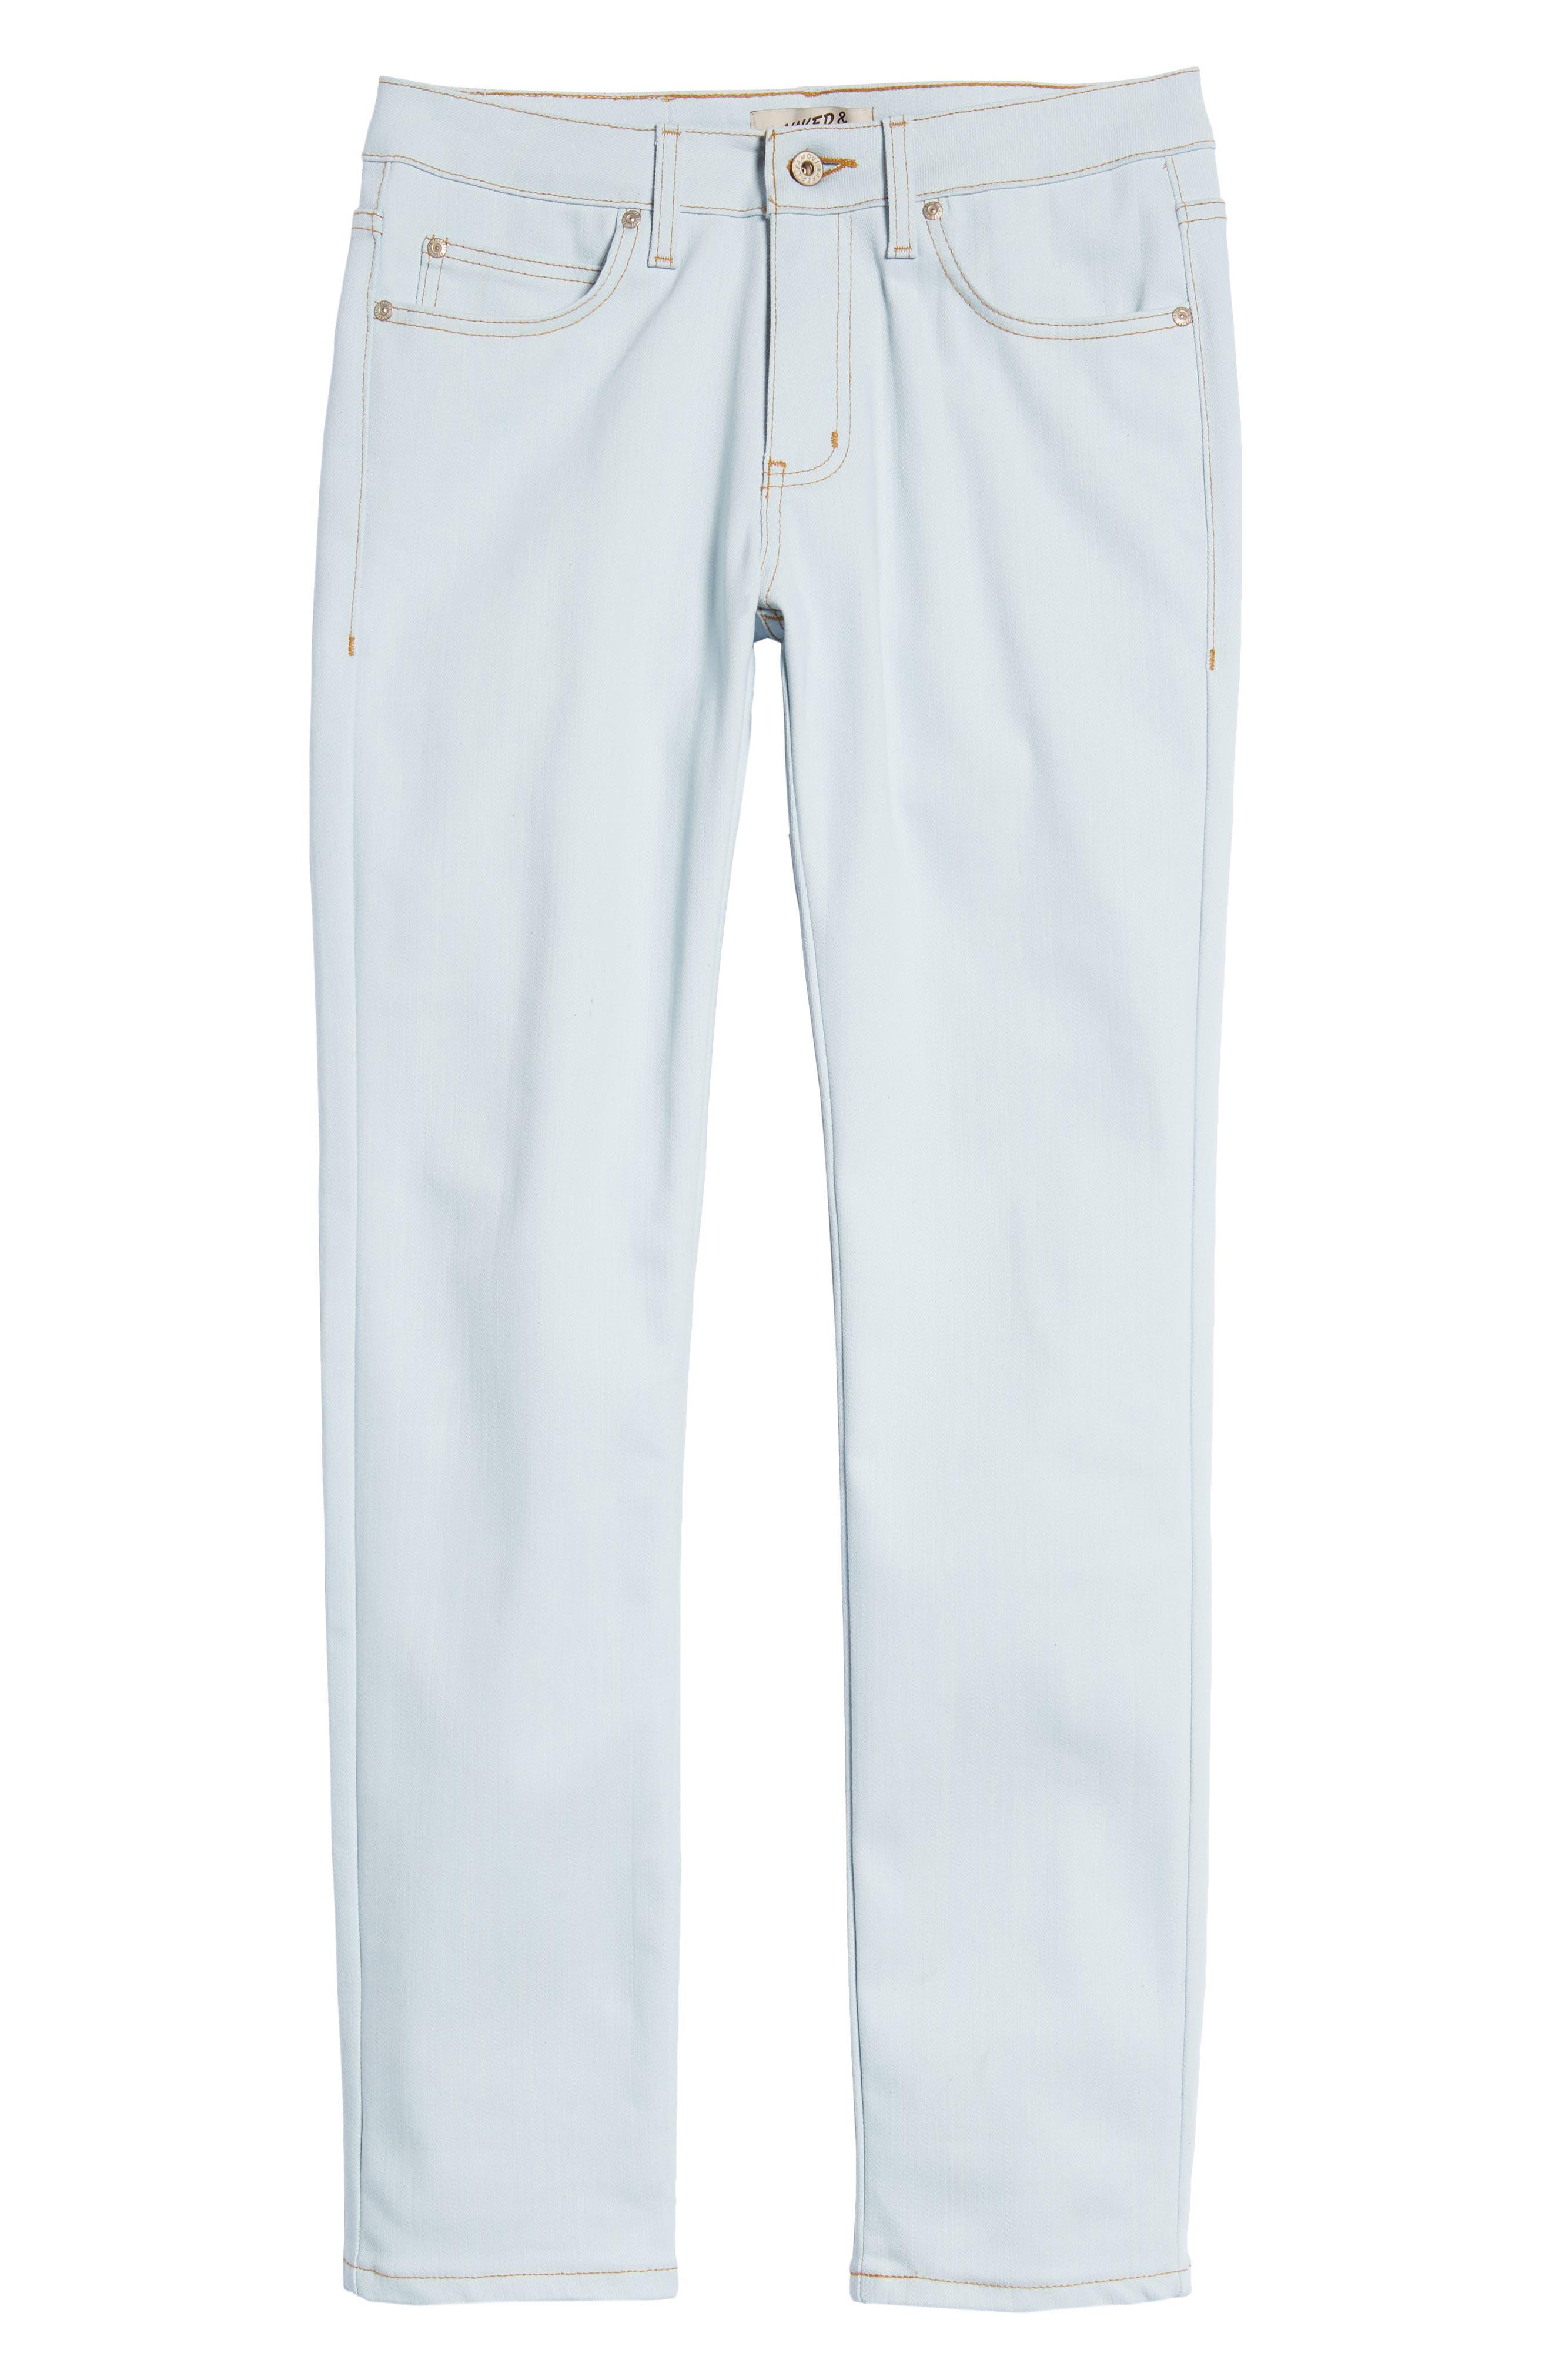 Naked & Famous Super Skinny Guy Skinny Fit Jeans,                             Alternate thumbnail 6, color,                             Powder Blue